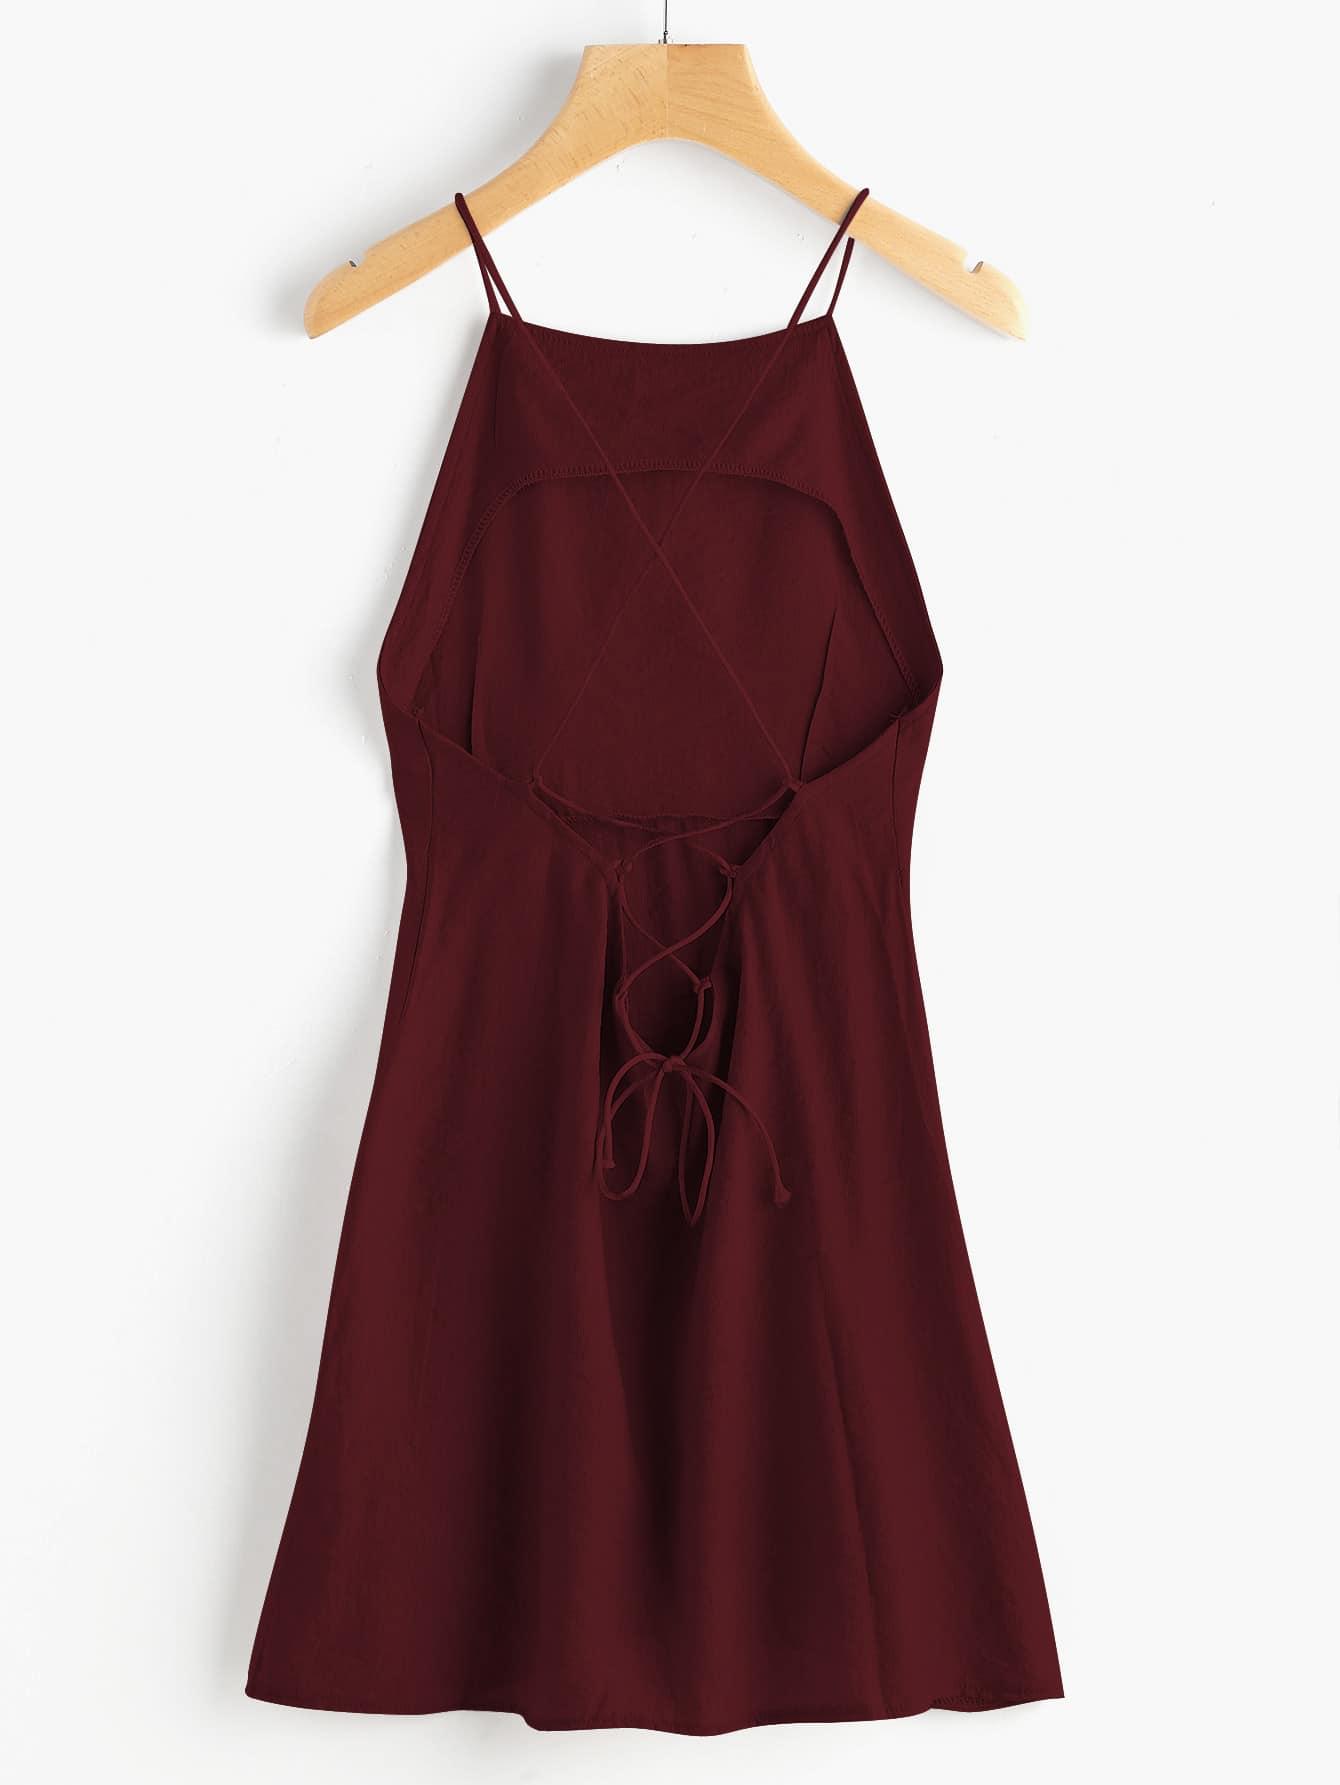 c9d81fdc2cceb4 White Crossback Lace Criss Cross Back Mini Dress - Latest Fashion ...